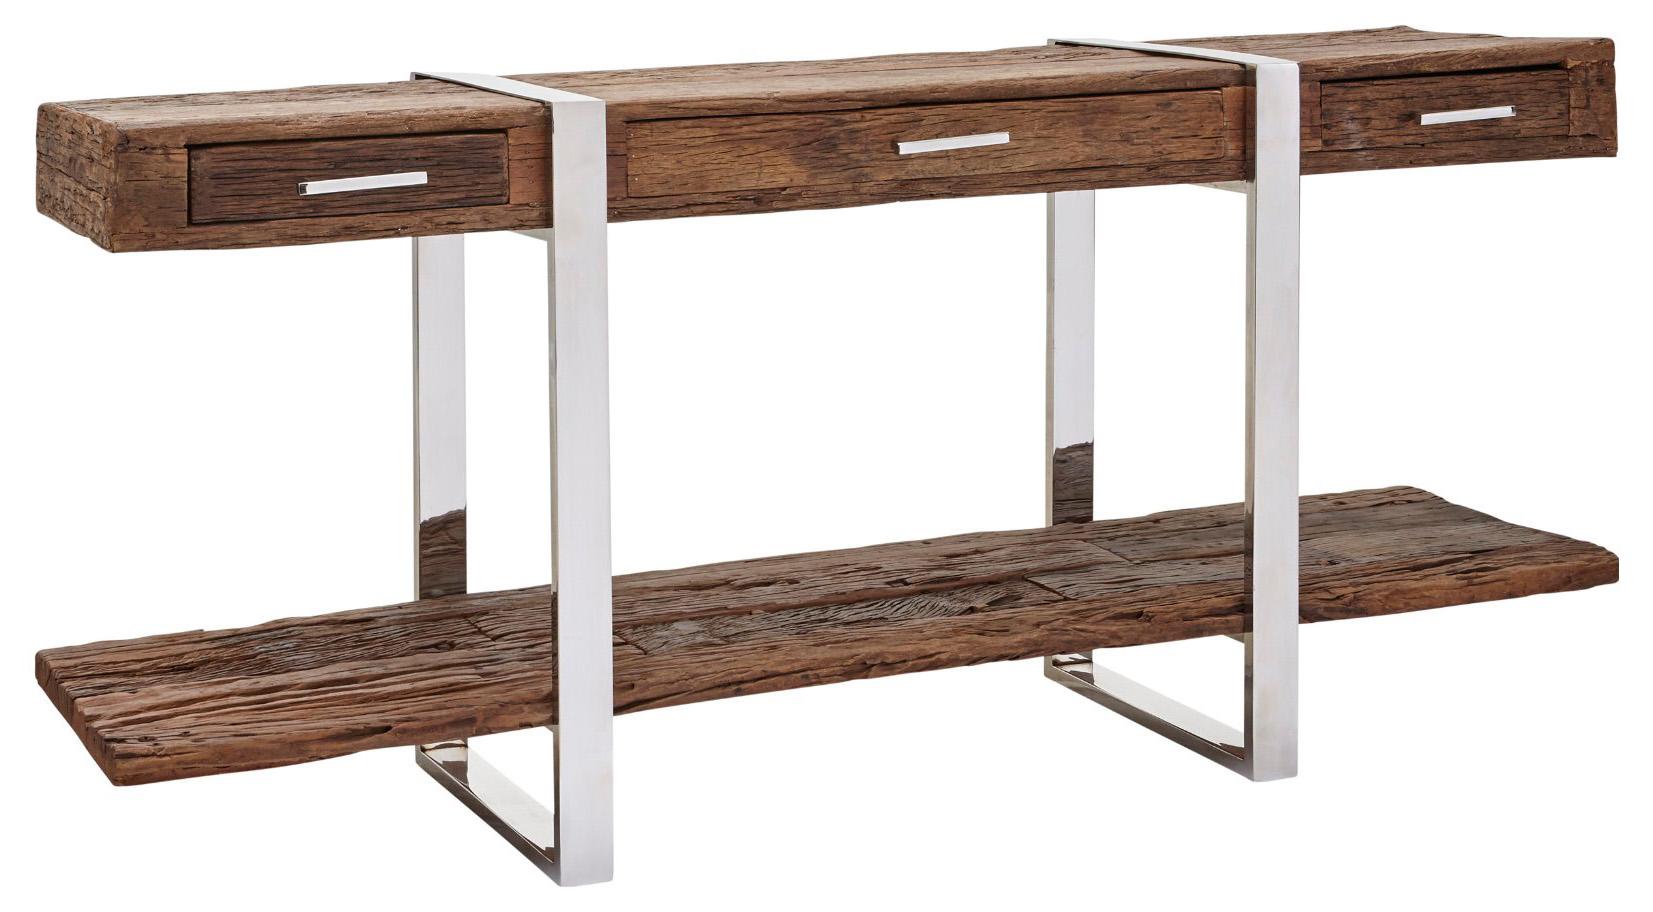 Sideboard Lebensart Rockfort aus Recyclingholz